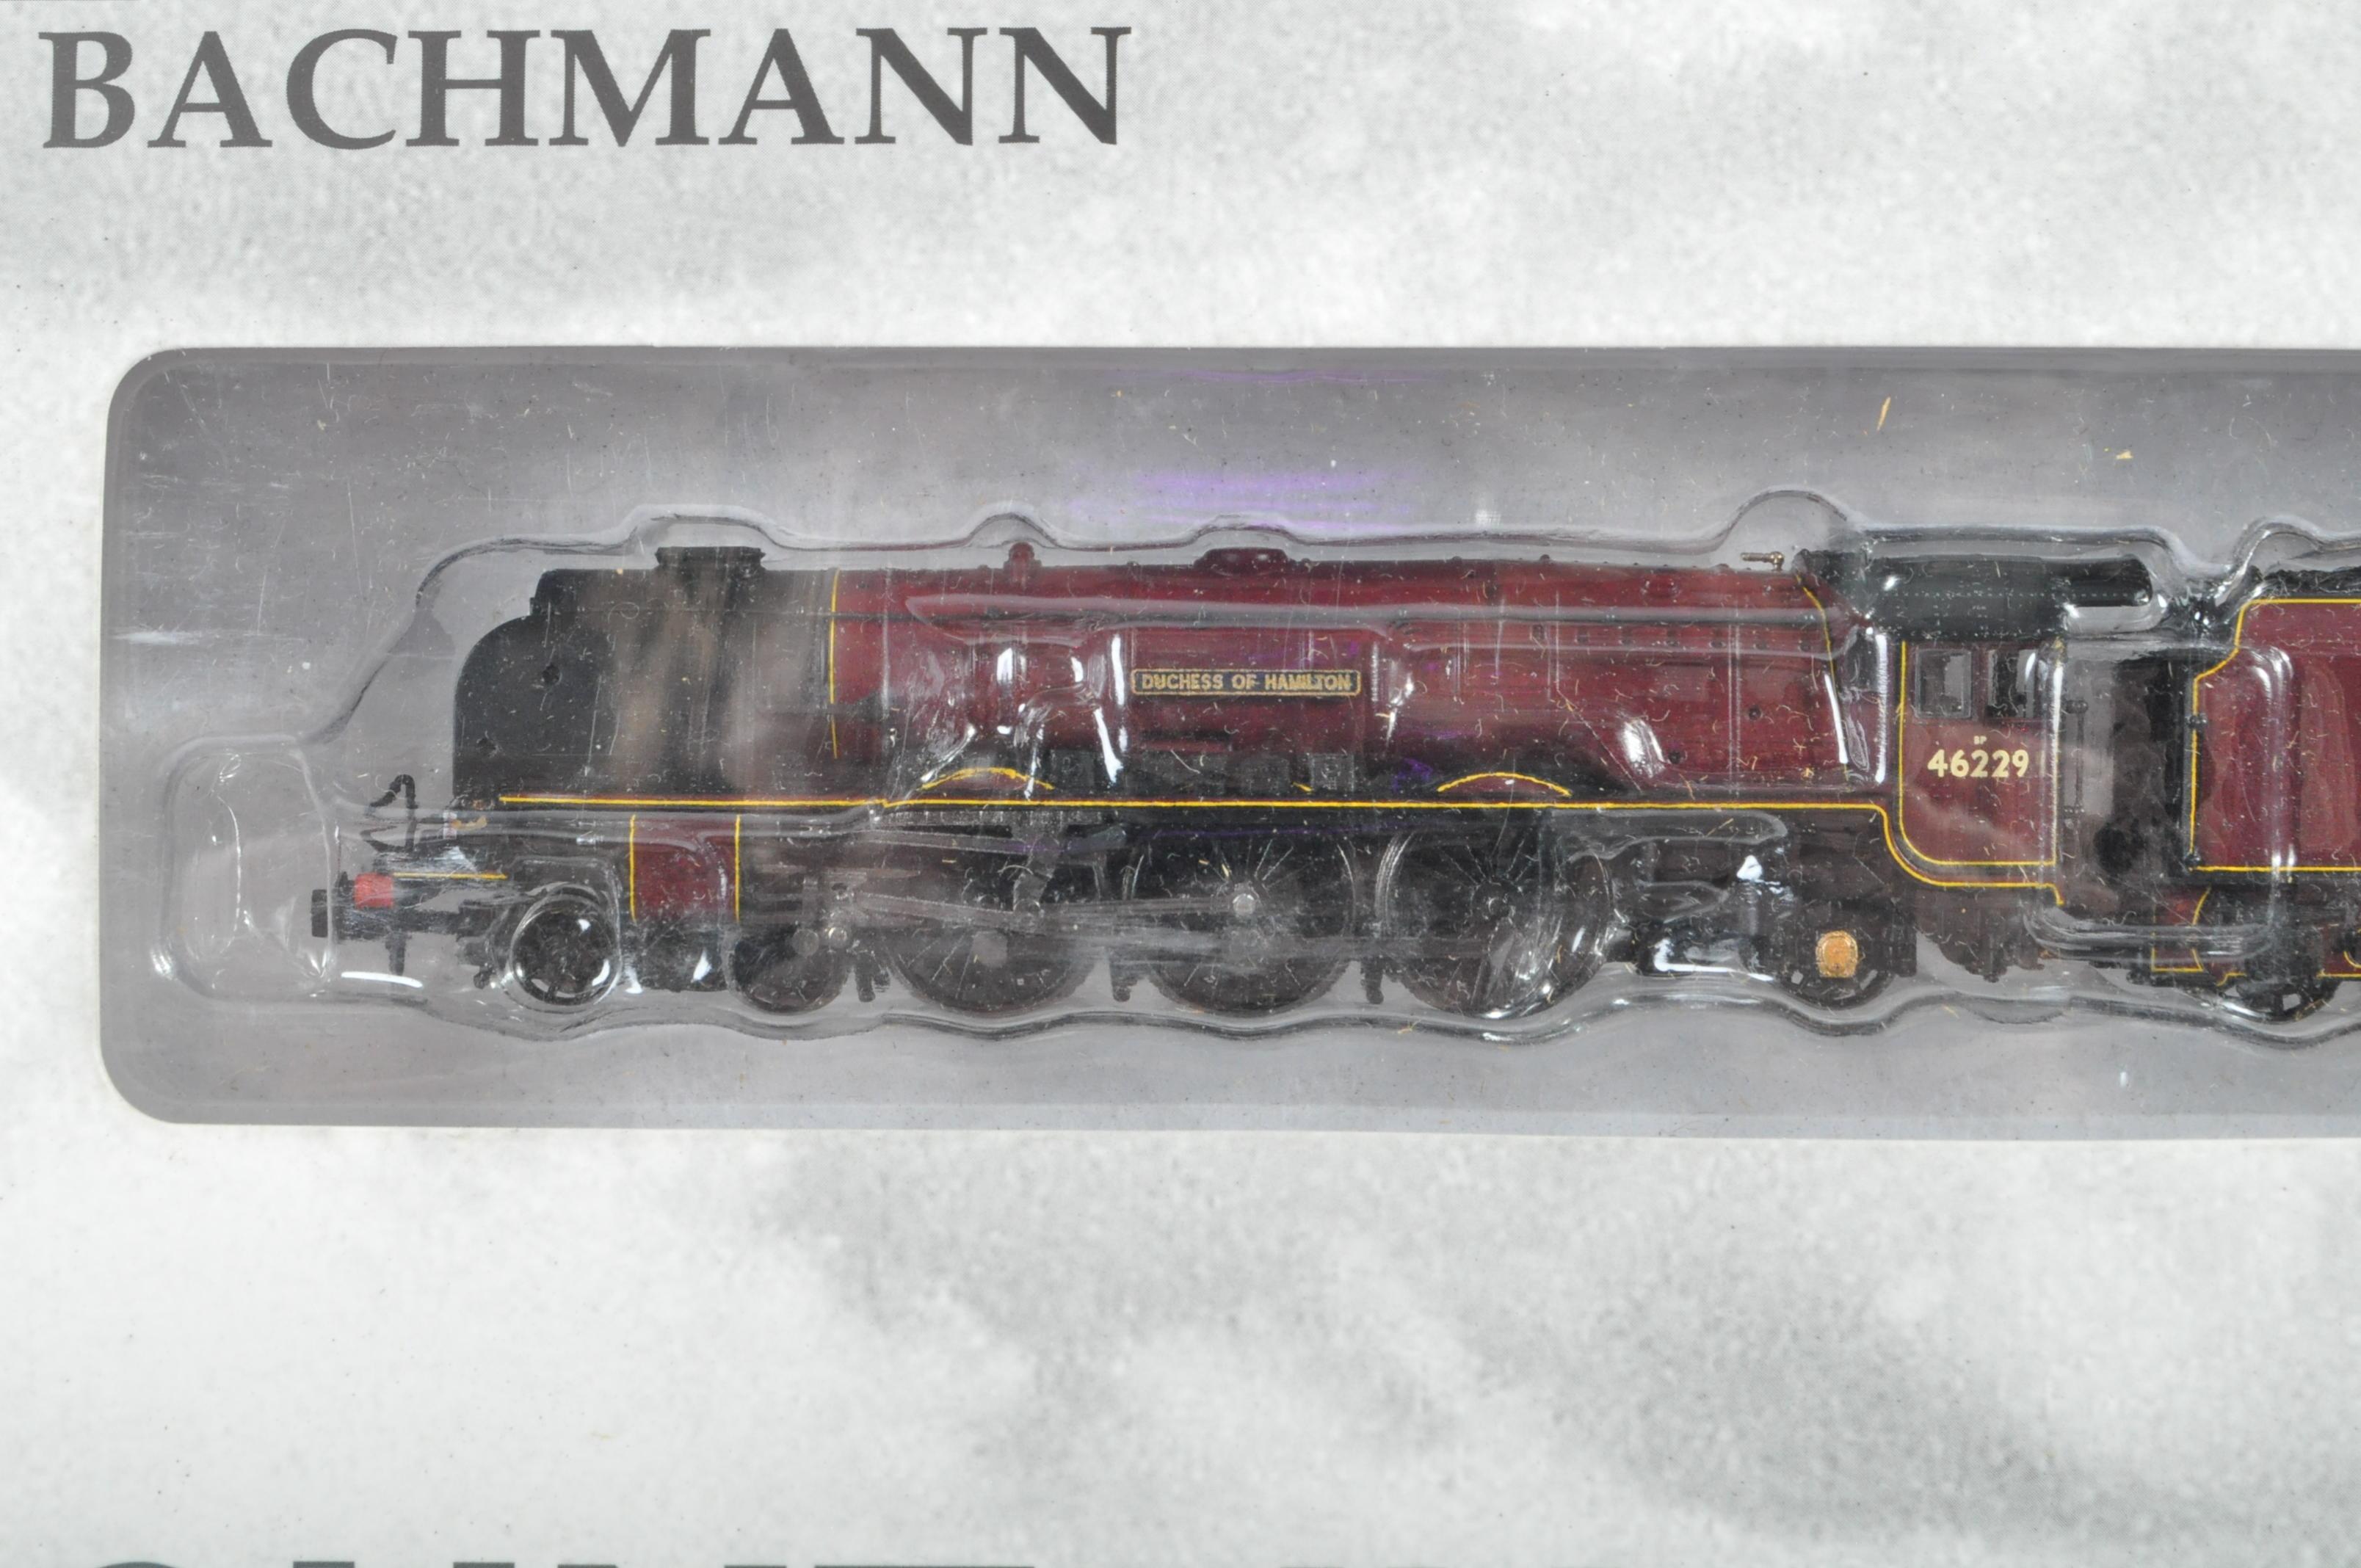 ORIGINAL BOXED GRAHAM FARISH CUMBRIAN MOUNTAIN EXPRESS TRAINSET - Image 2 of 9